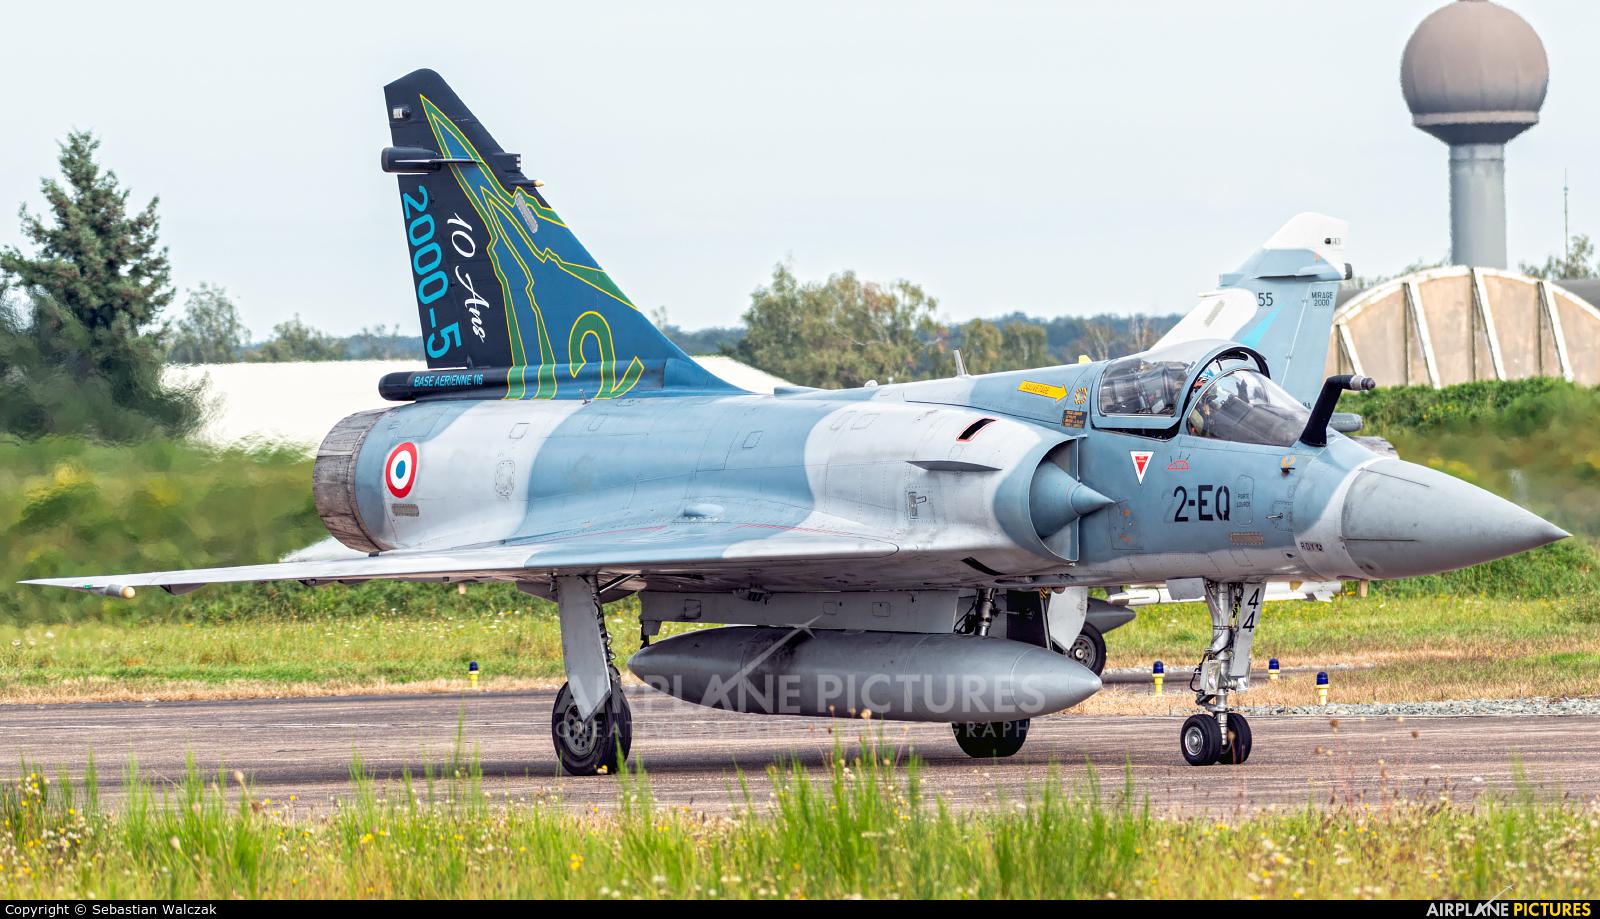 France - Air Force 44 aircraft at Luxeuil-Saint-Sauveur AB